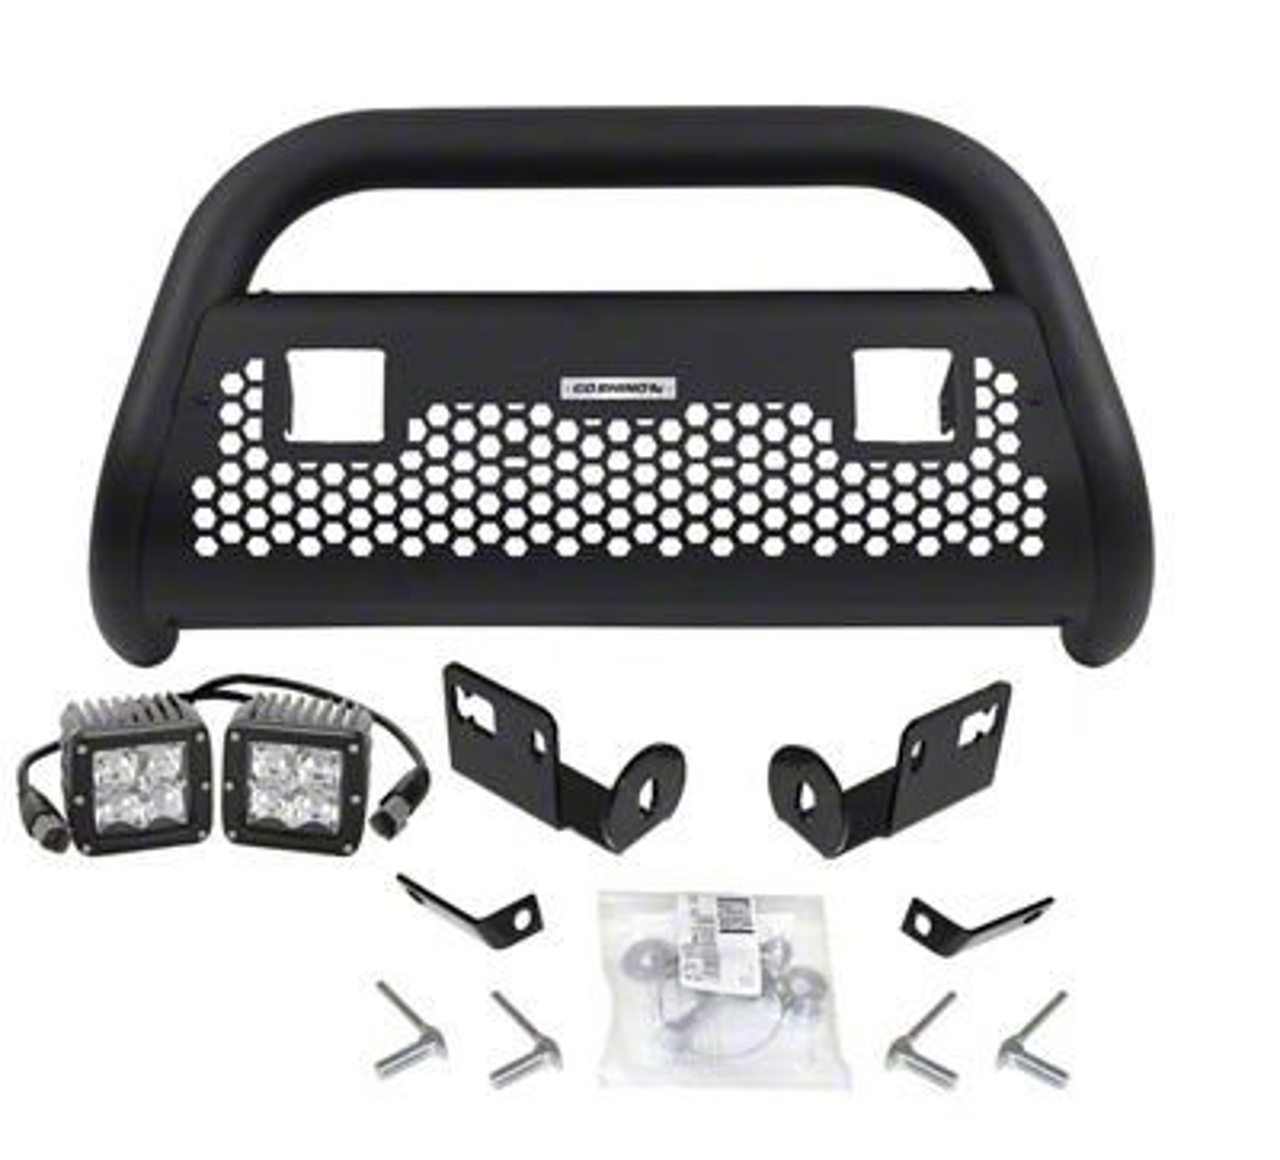 Go Rhino RC2 LR Bull Bar w/ LED Lights - Textured Black (09-18 RAM 1500, Excluding Rebel)